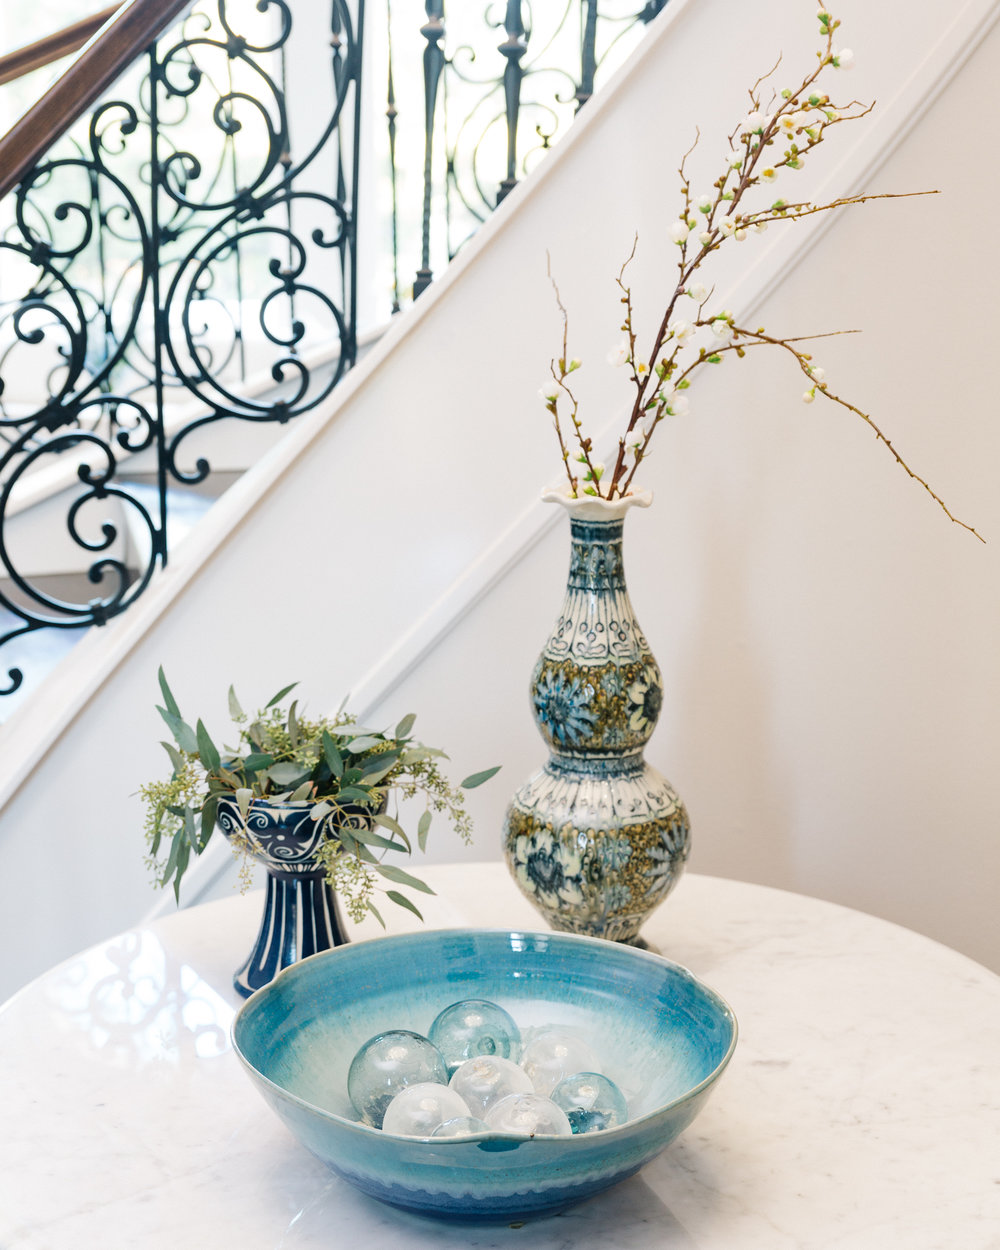 Entry Hall Foyer | Carla Aston - Designer, Shaun Bain - Contractor, Colleen Scott - Photographer #console #foyer #entryhall #foyerideas